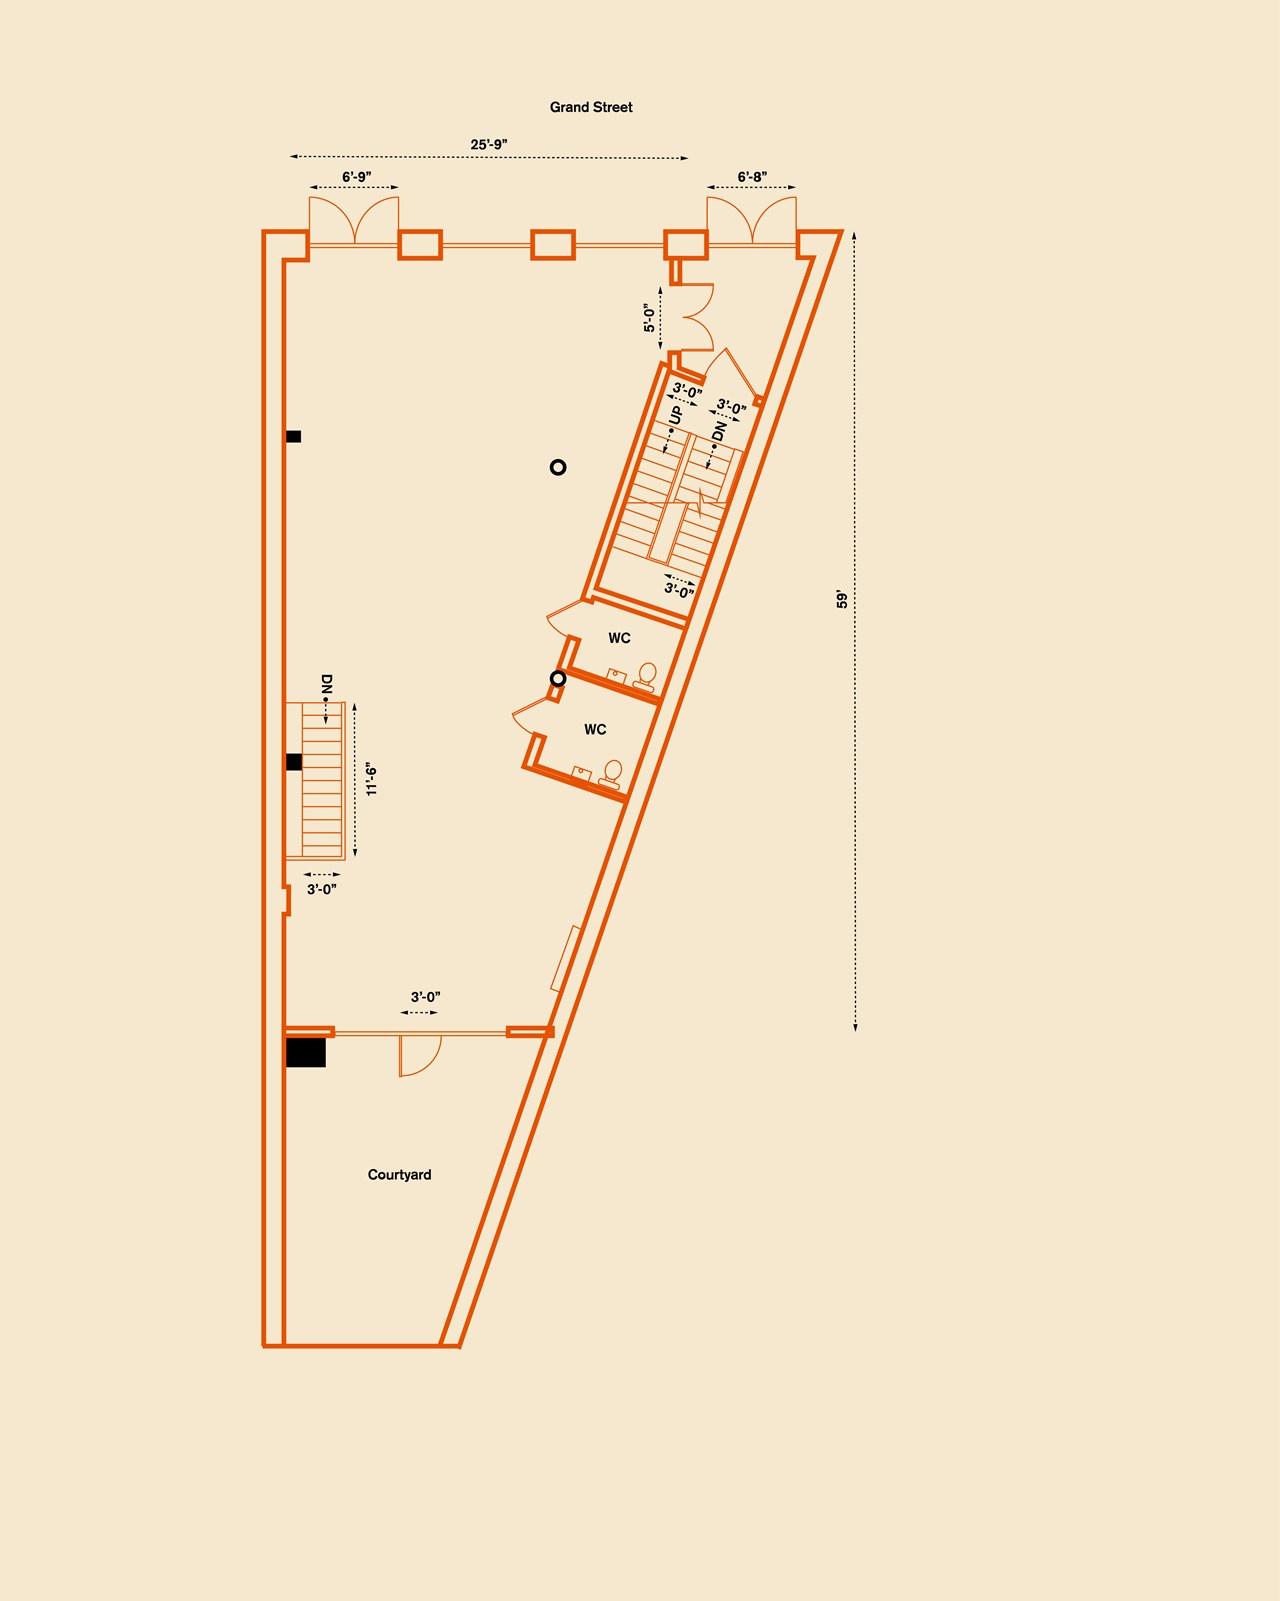 IndustriaNYC-GrandStreetRental-FloorPlan.jpg